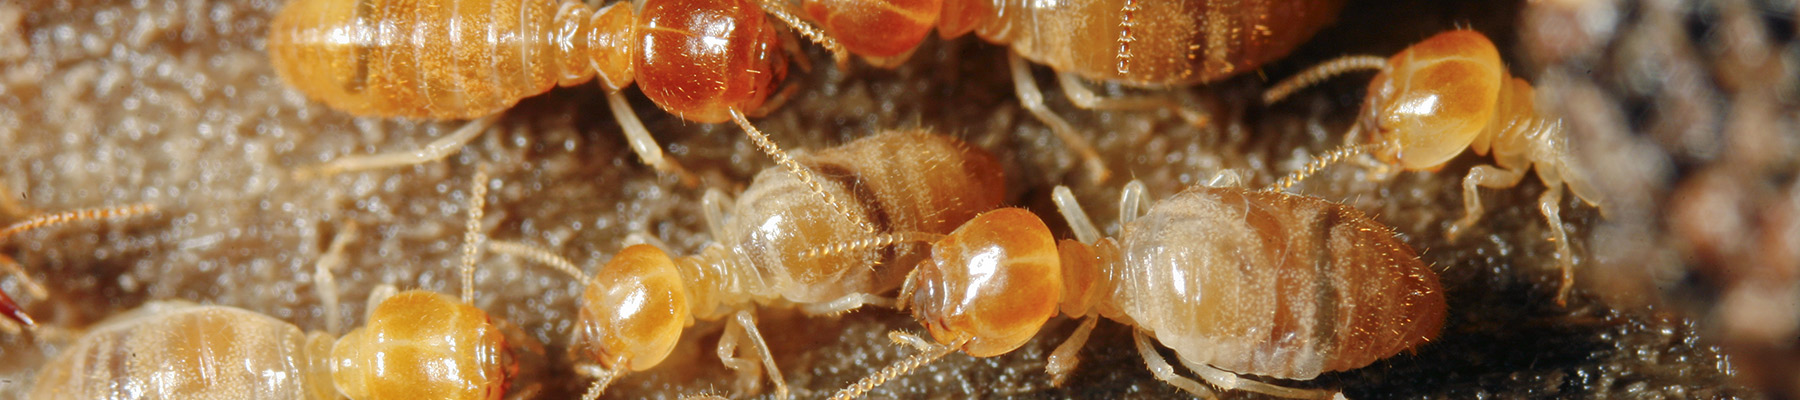 Termites in myrtle beach homes